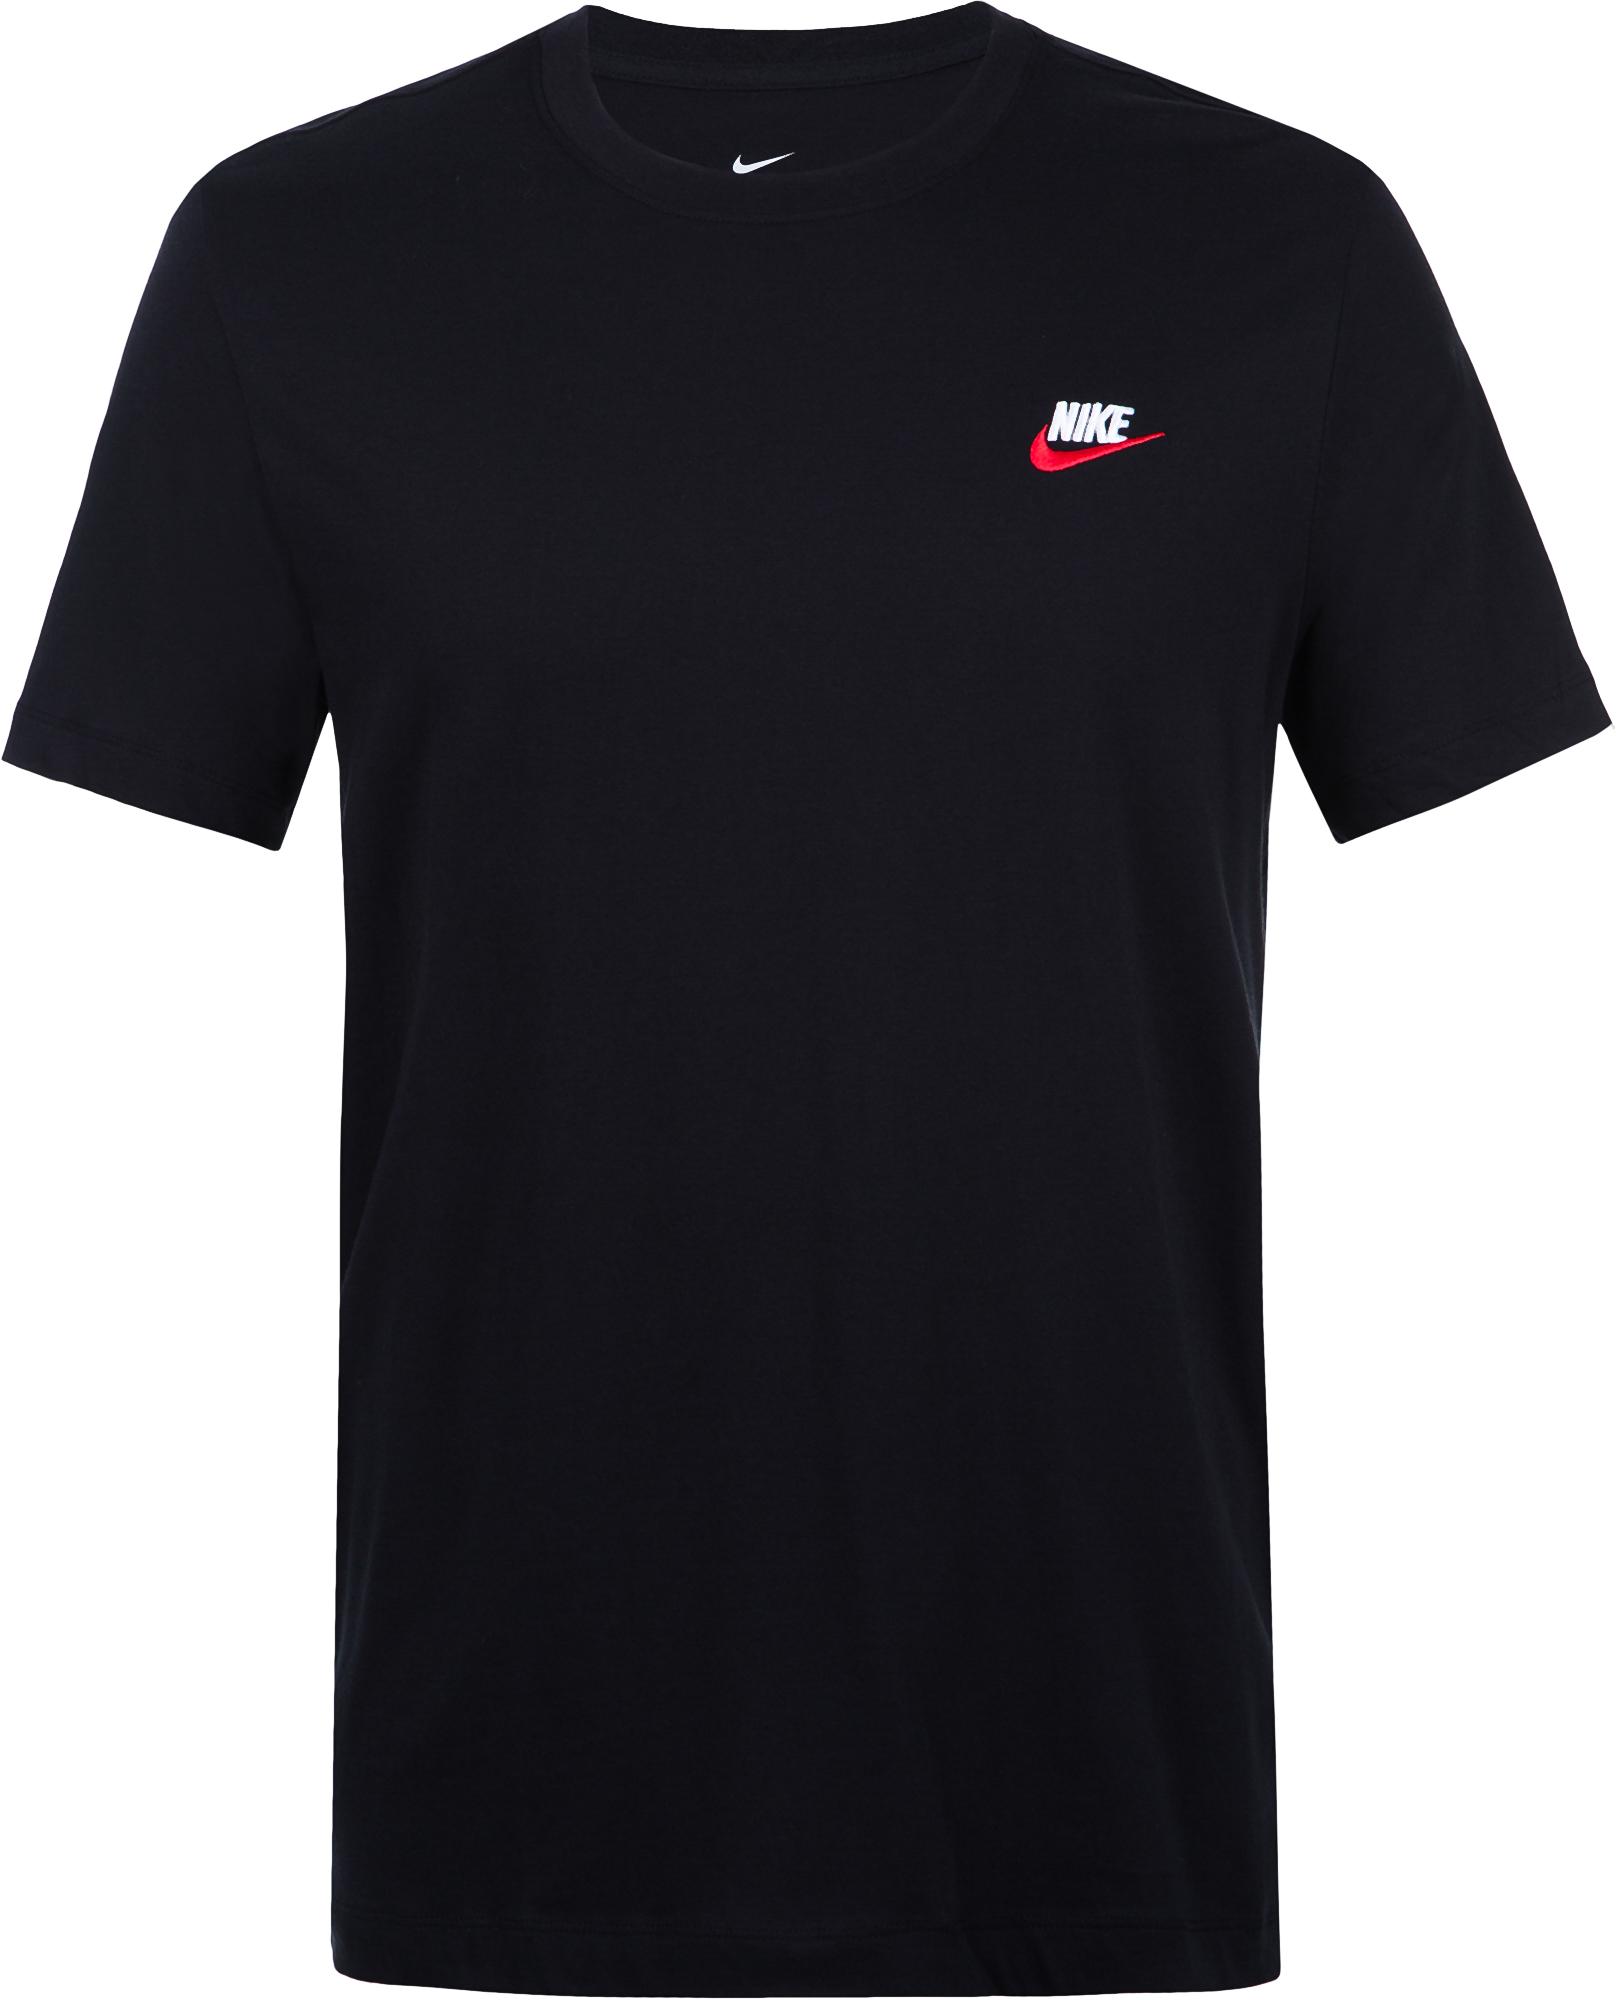 Nike Футболка мужская Club, размер 52-54